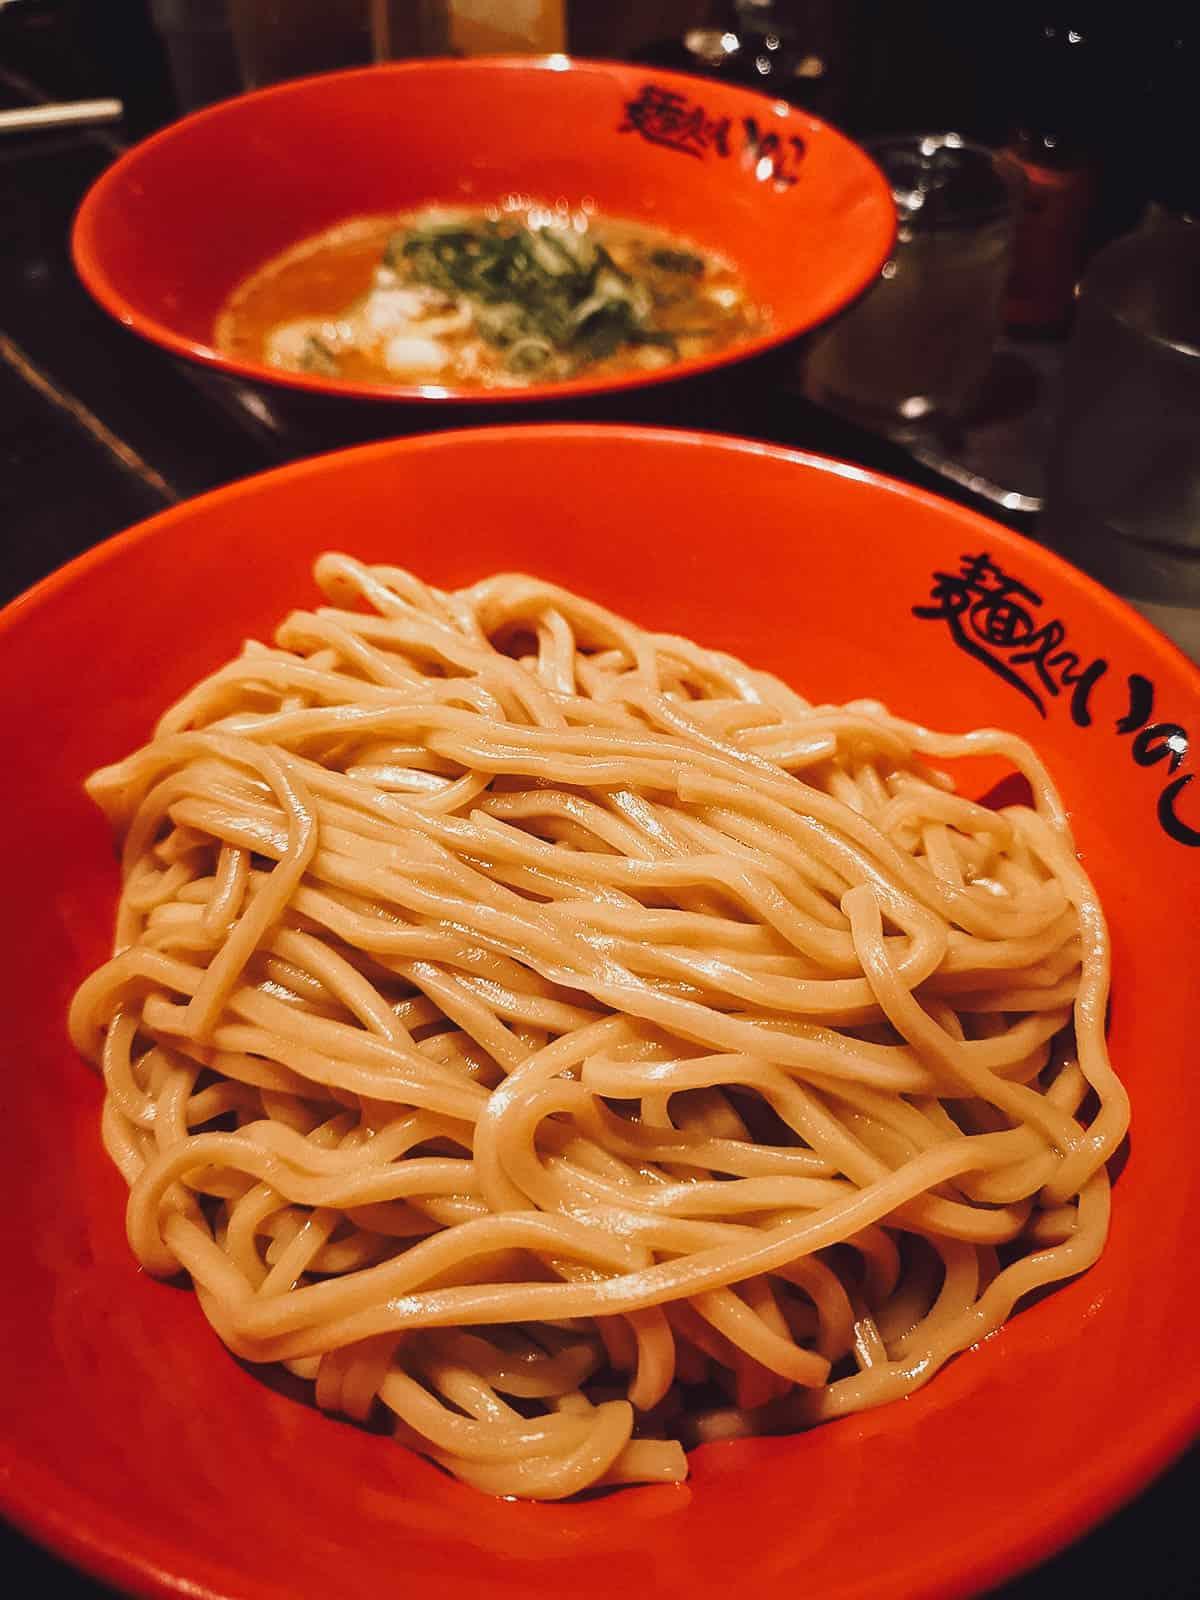 Ebi miso tsukemen at 麺処いのこ平和台店 in Tokyo, Japan